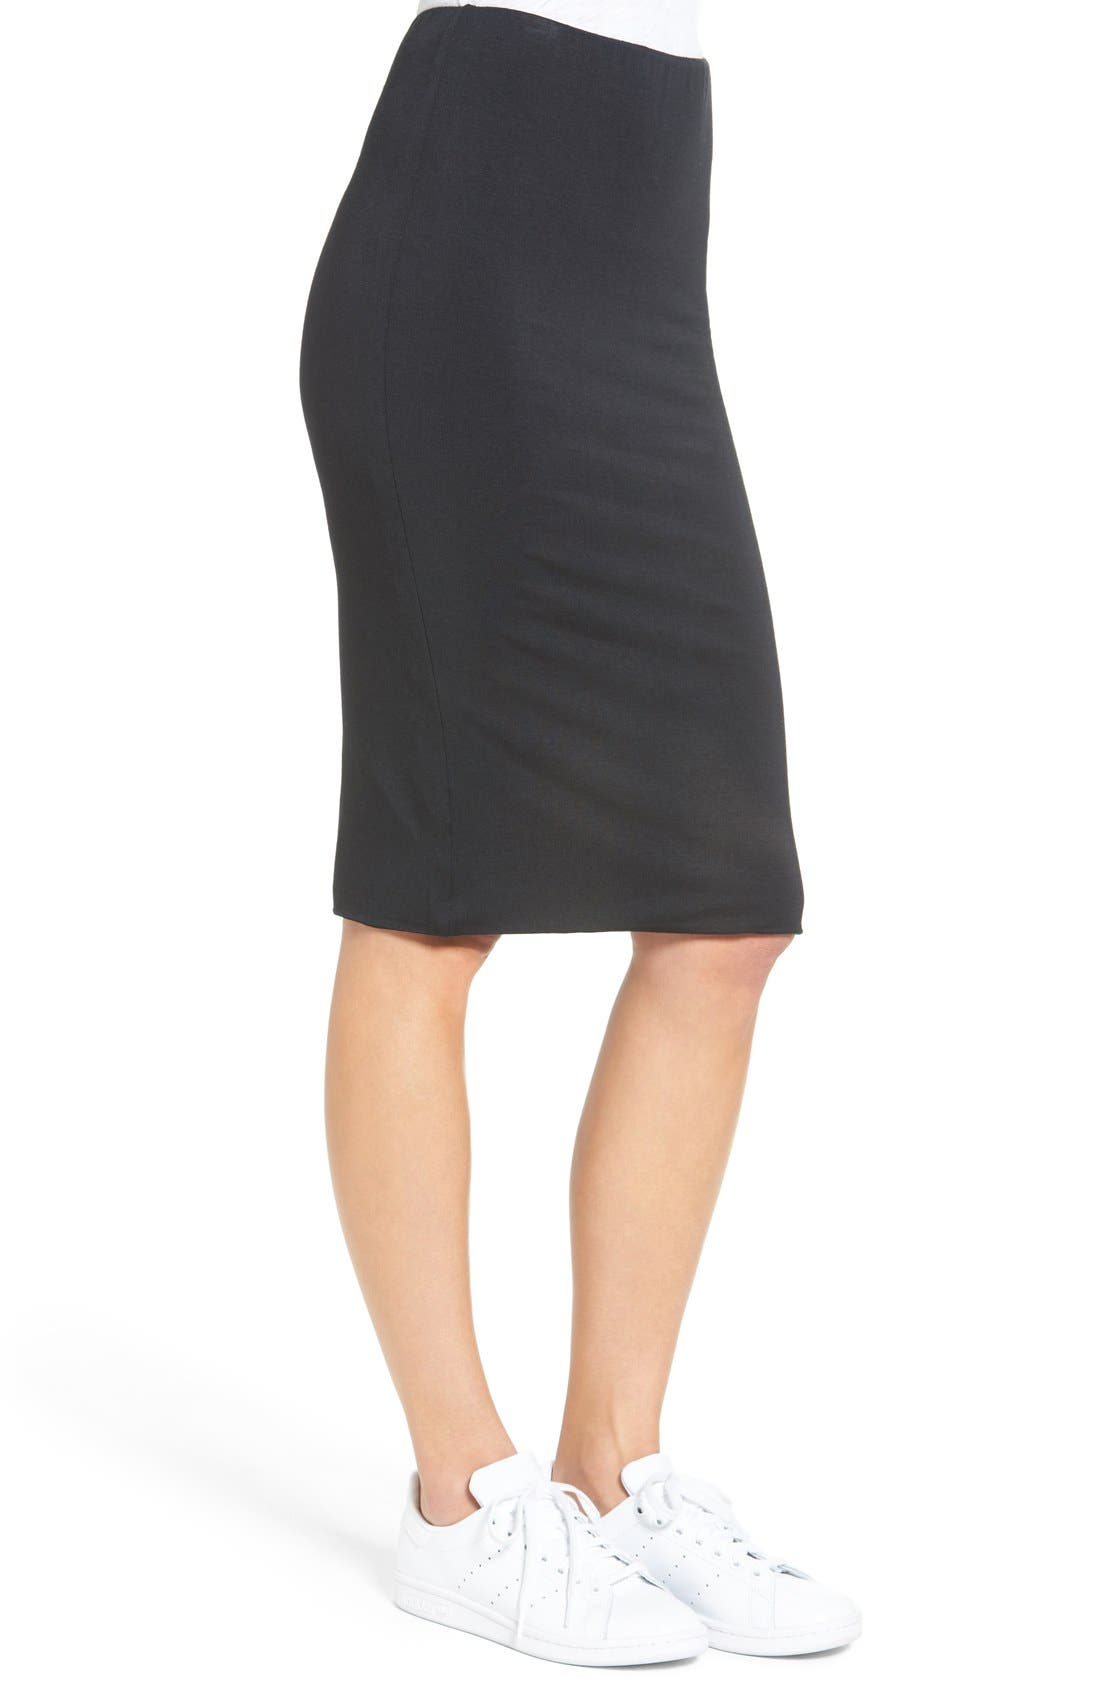 Alternate Image 3  - Amour Vert 'Yuma' Stretch Knit Skirt